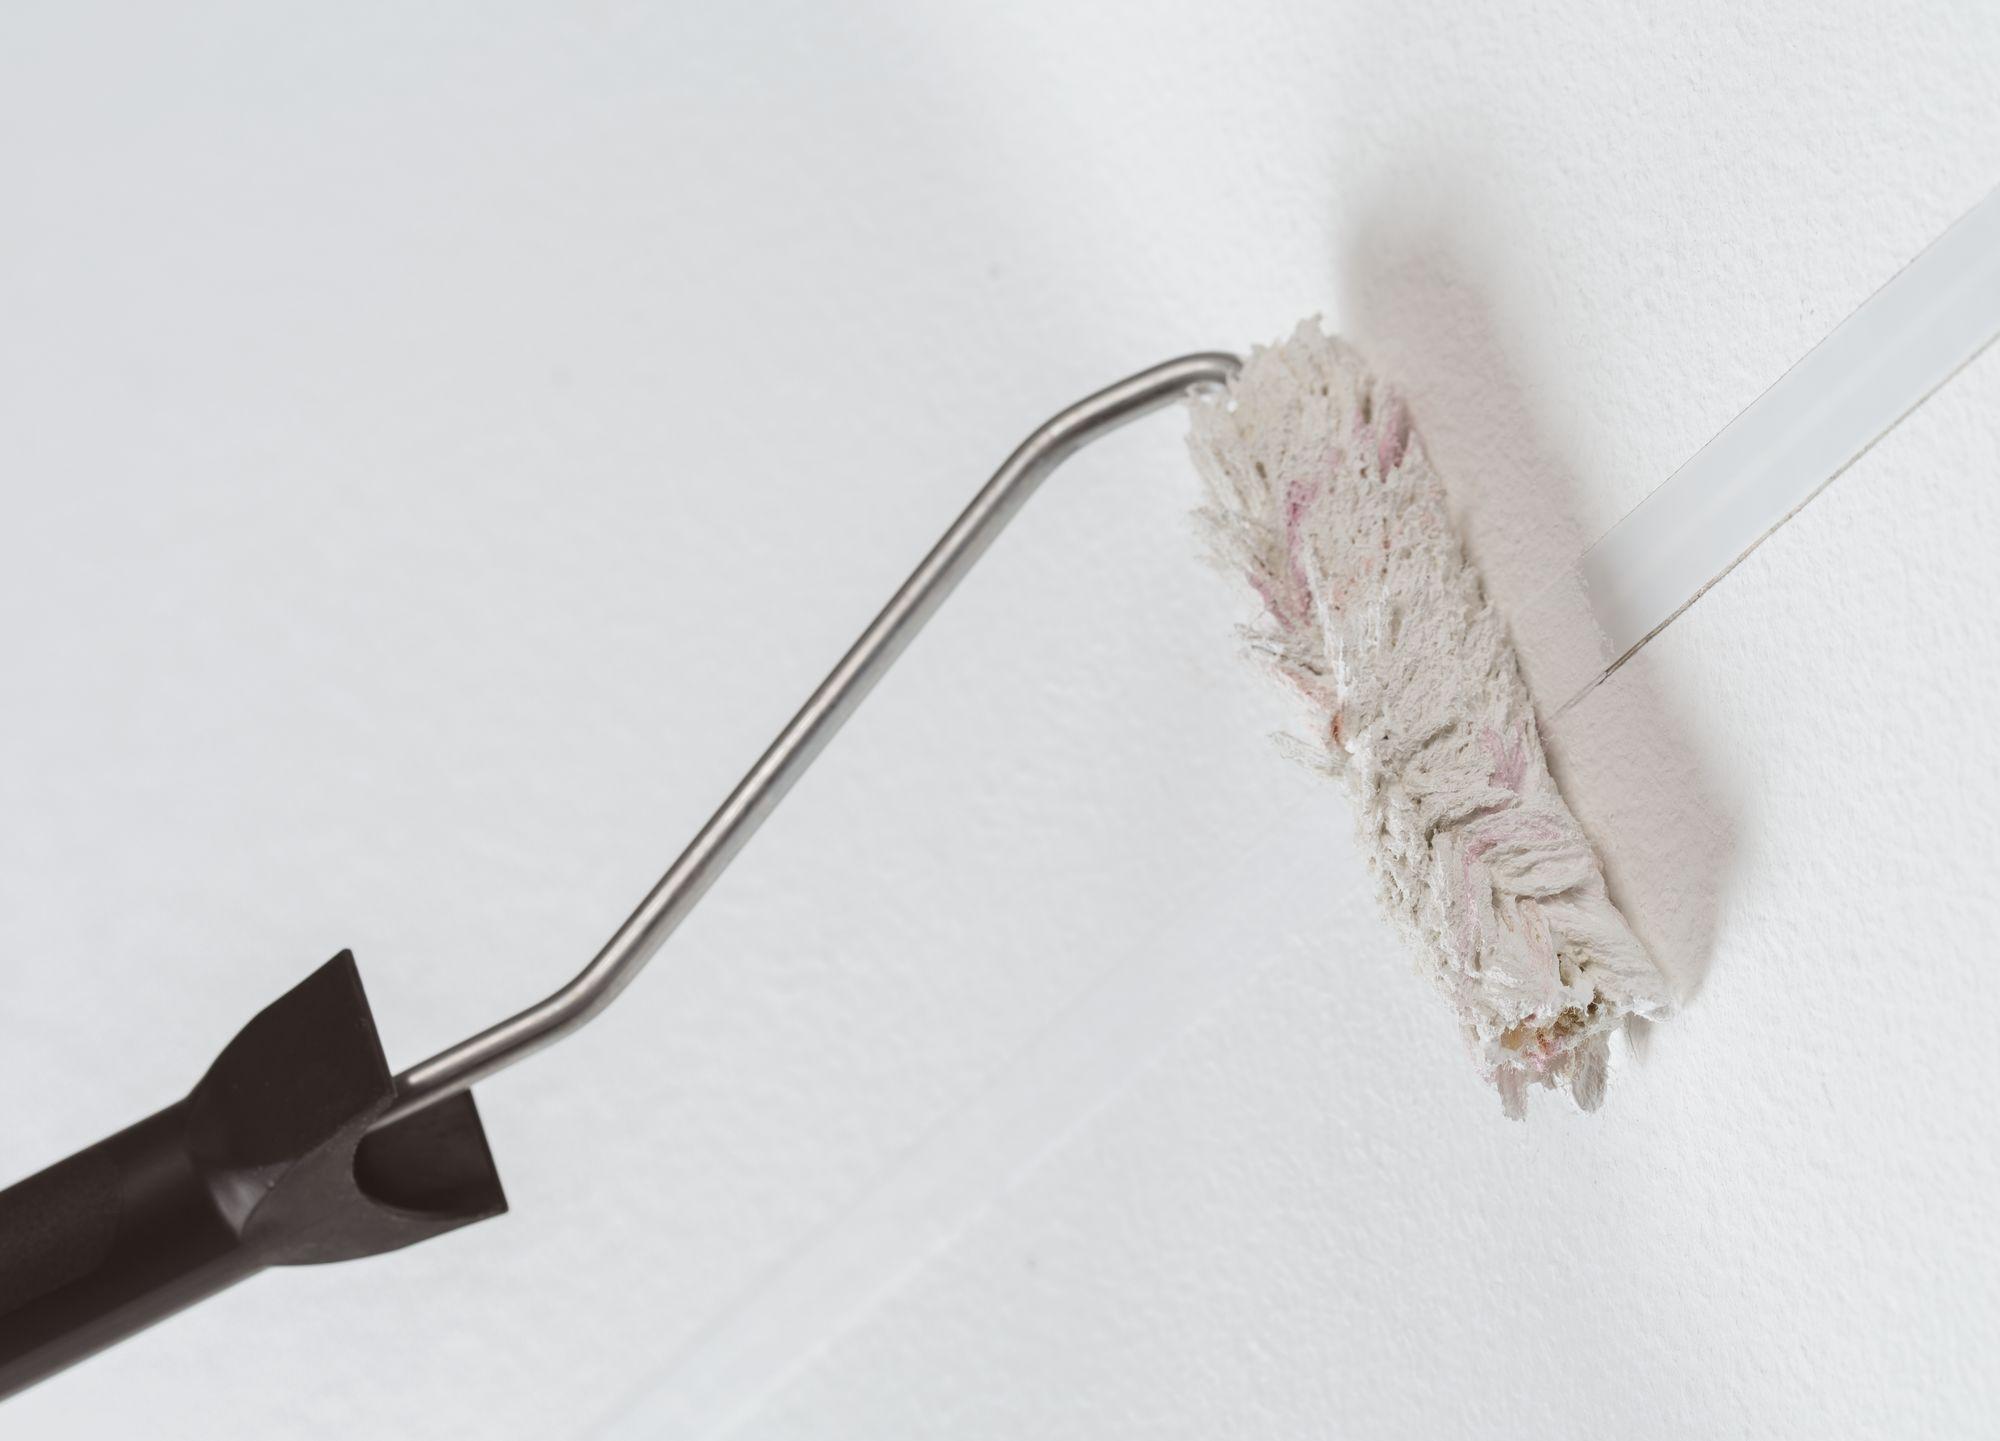 Kunststoff Function YourLED Flat-Connector inkl Verbinder 5 m weiß